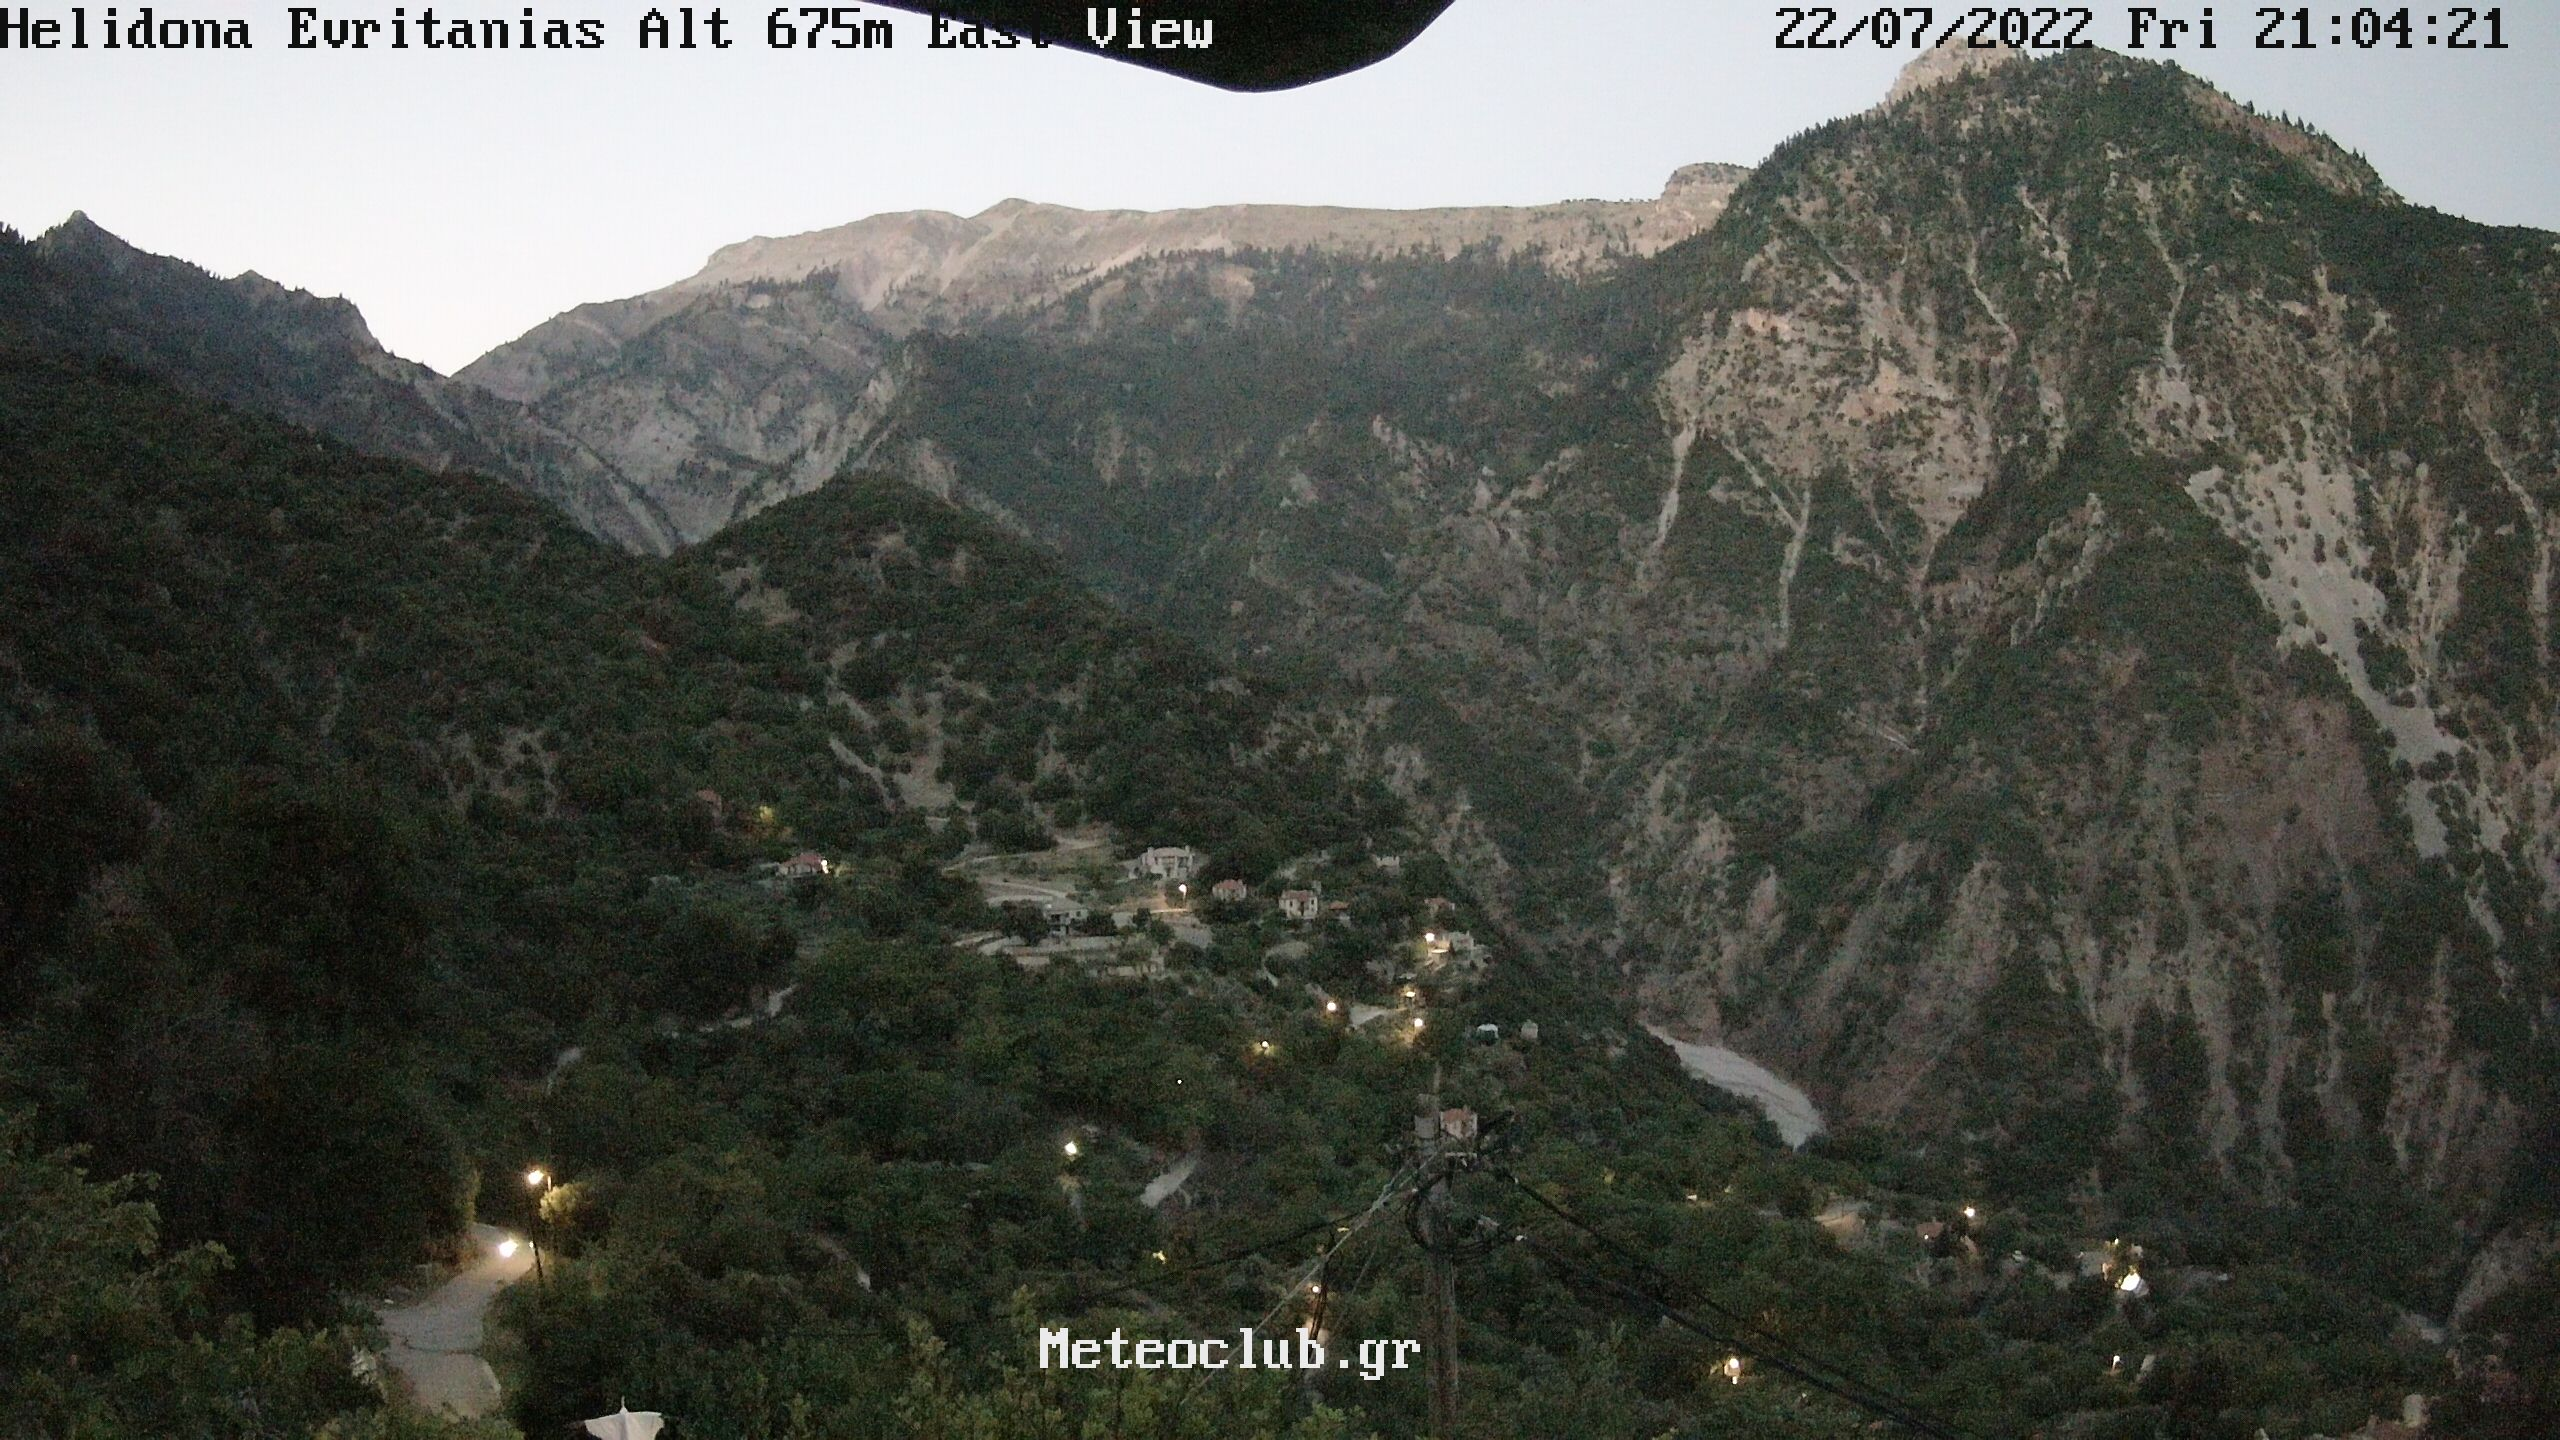 Webcam Χελιδόνα Ευρυτανίας 2